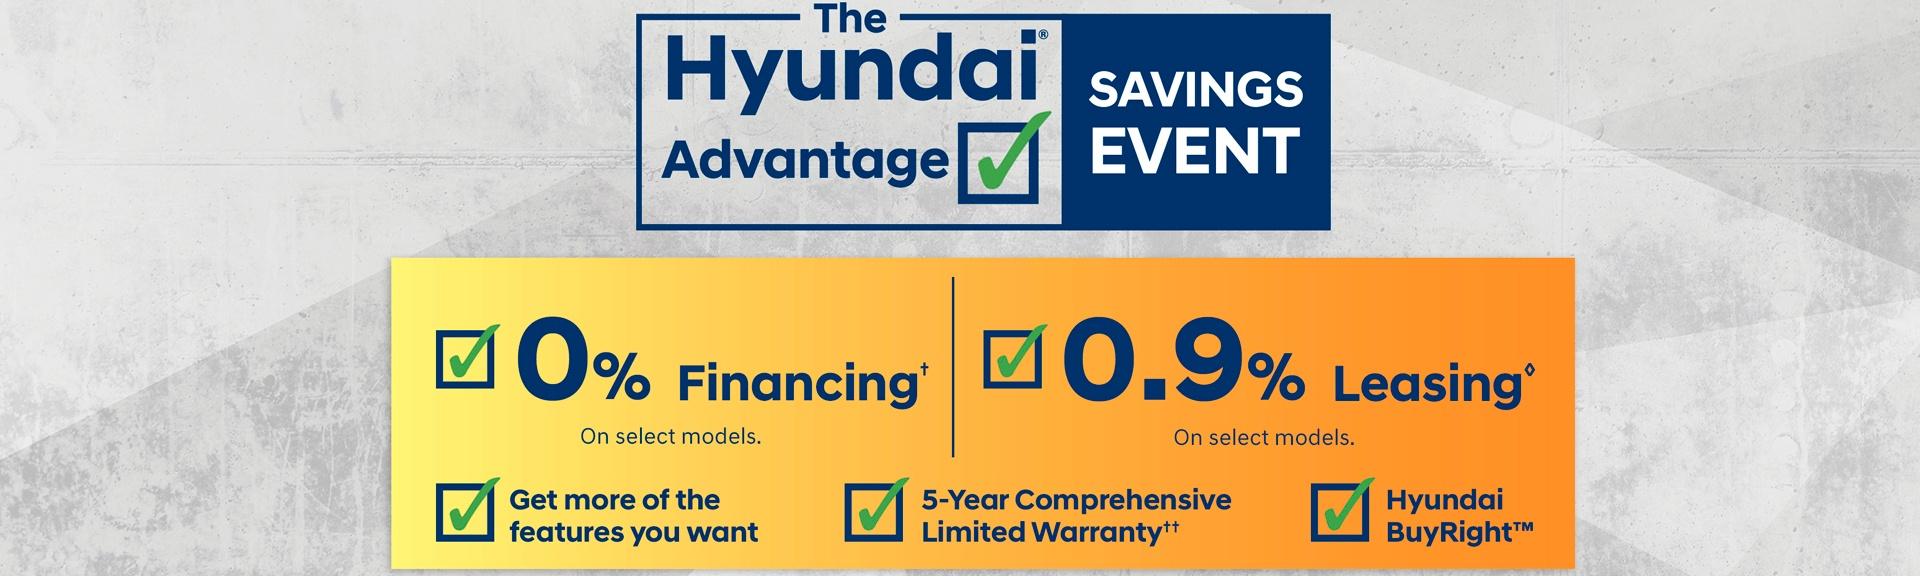 Hyundai Advantage Savings Event